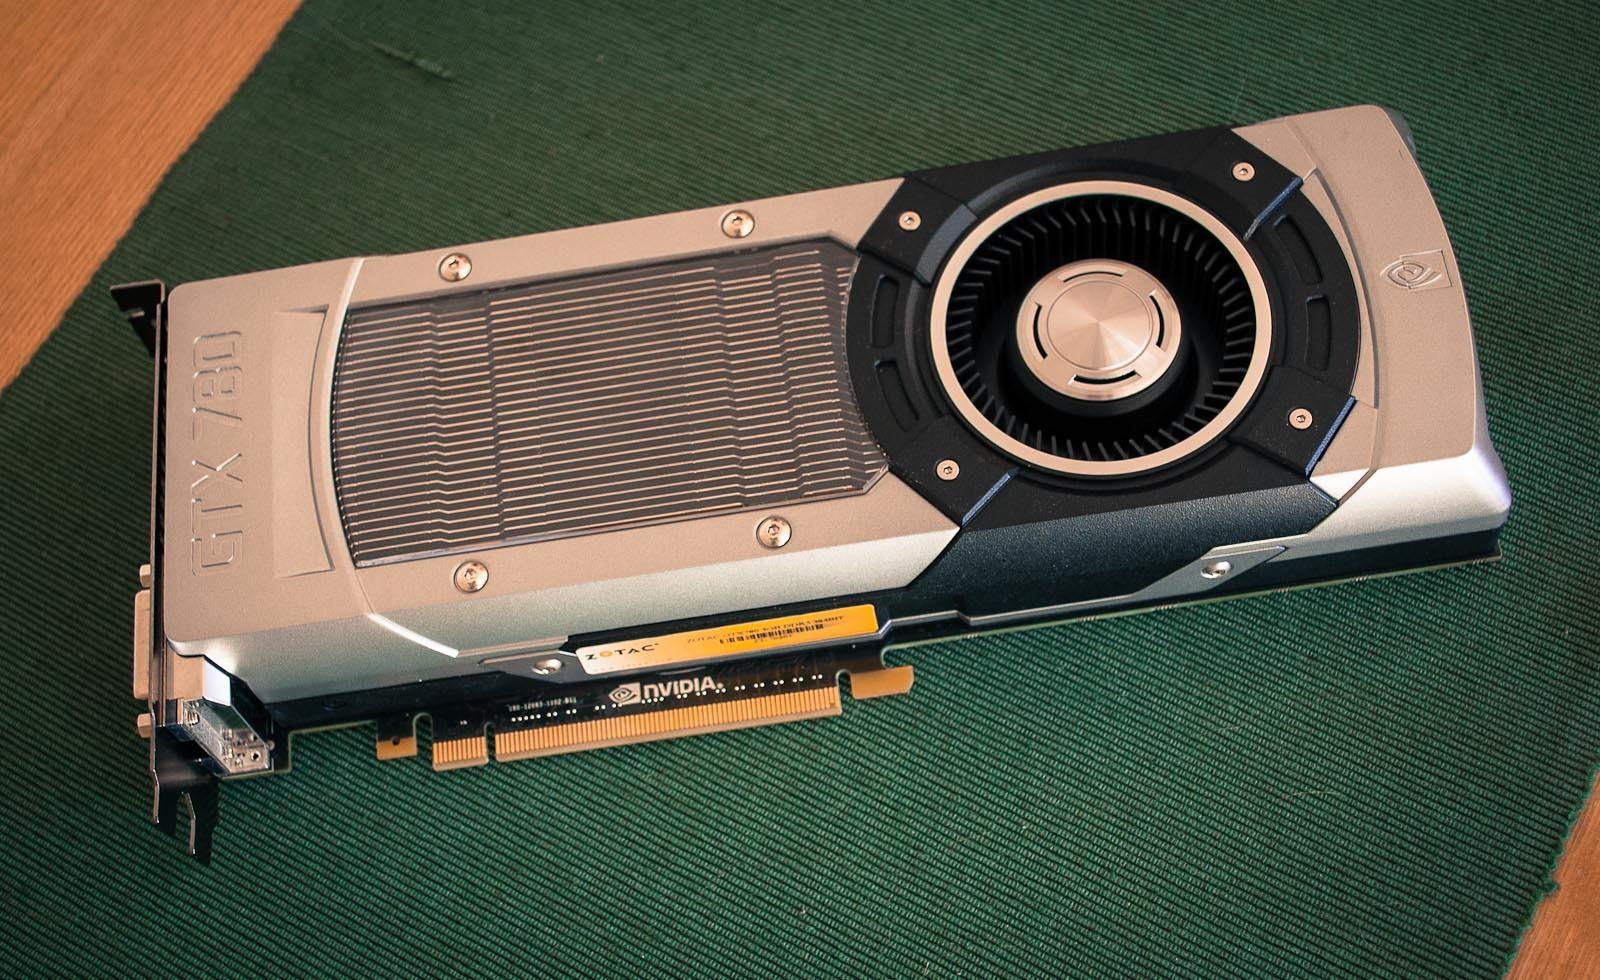 Foto de NVidia GTX 780, análisis (15/15)